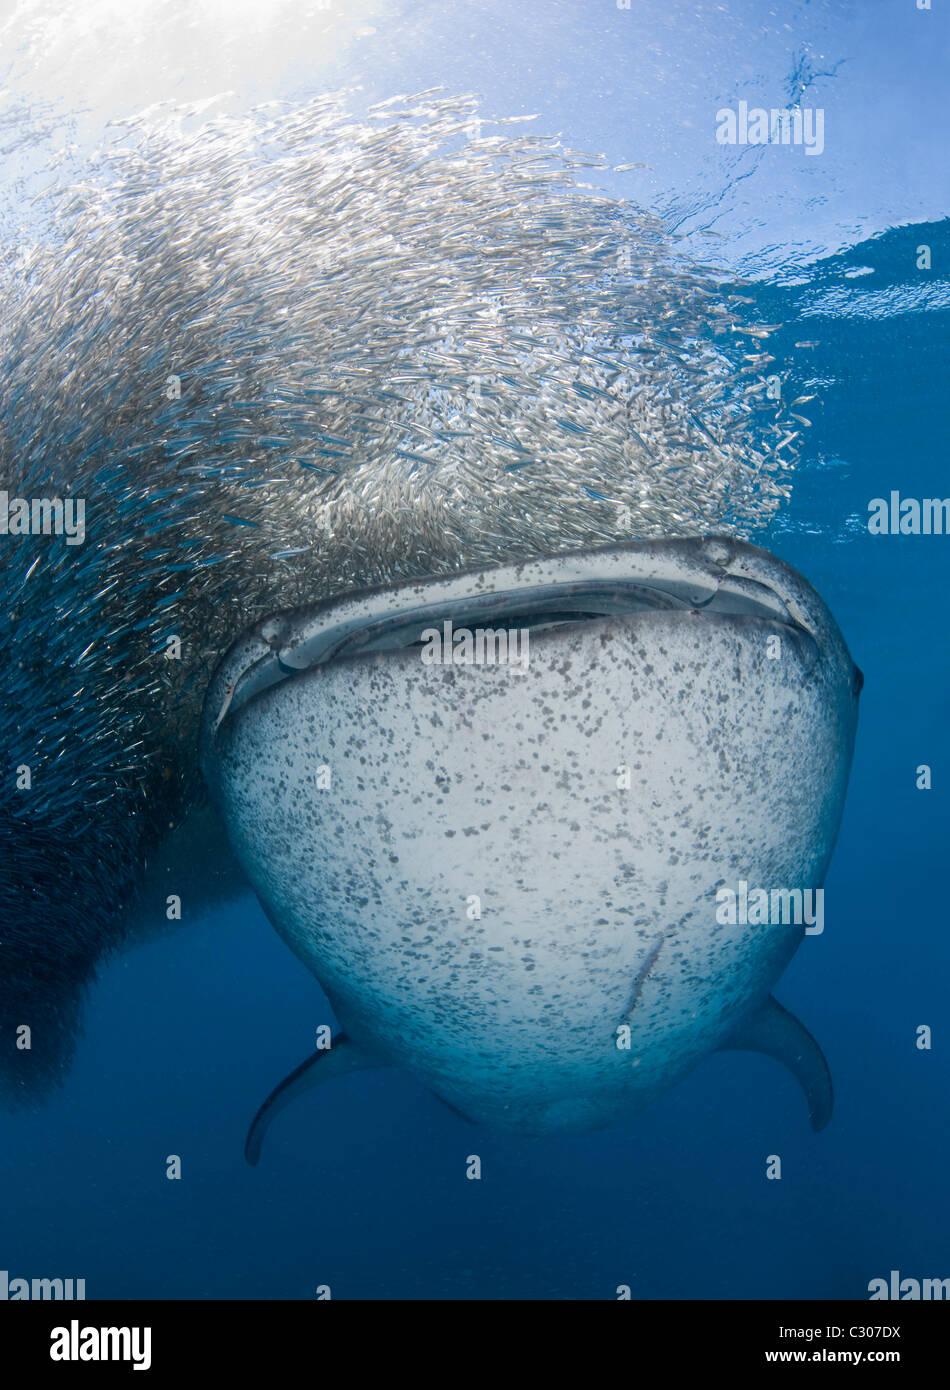 Tiburón ballena (Rhincodon typus) alimentándose de baitball de pejerreyes Imagen De Stock